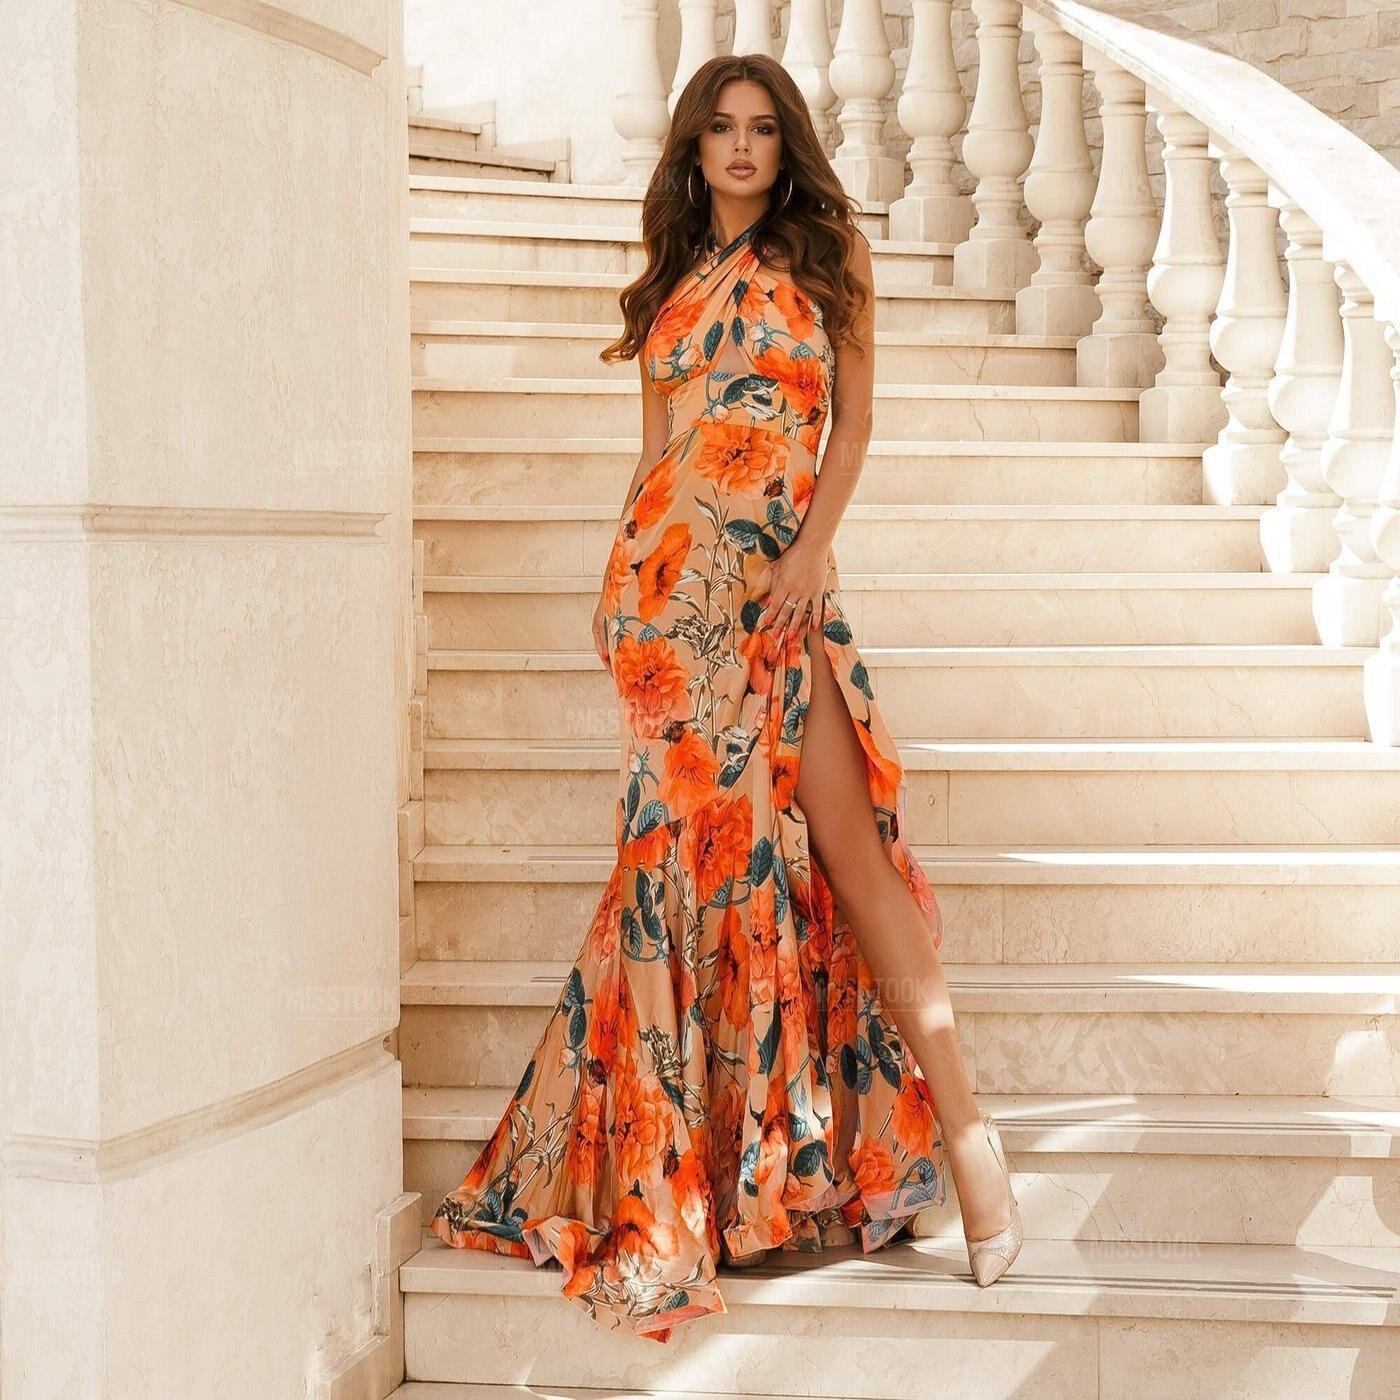 2021 Fashion Summer High Split Boho Backless Beach Dress Women Floral Print Sleeveless Maxi Party Elegant Vintage